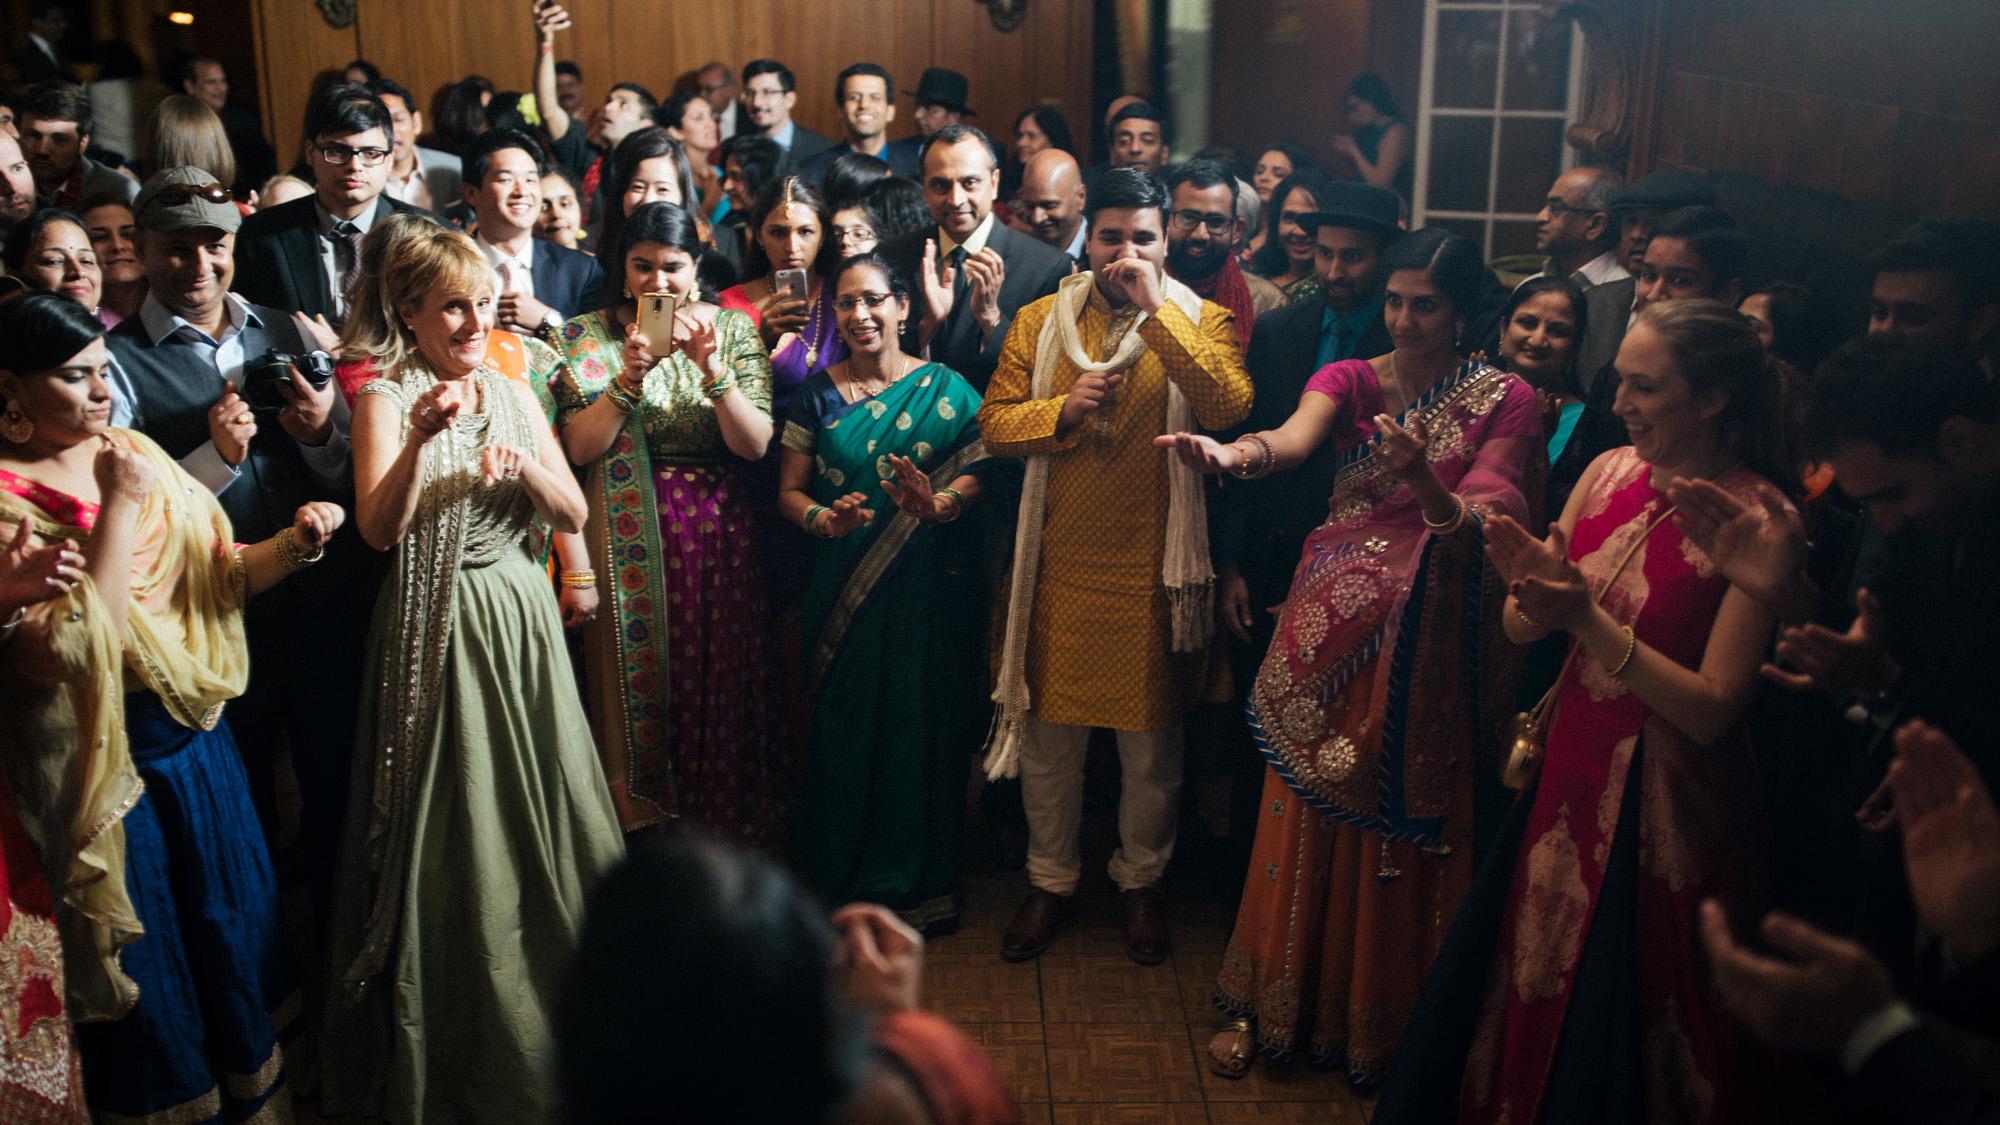 anu_maneesh_alec_vanderboom_Indian_wedding_photography-0173.jpg